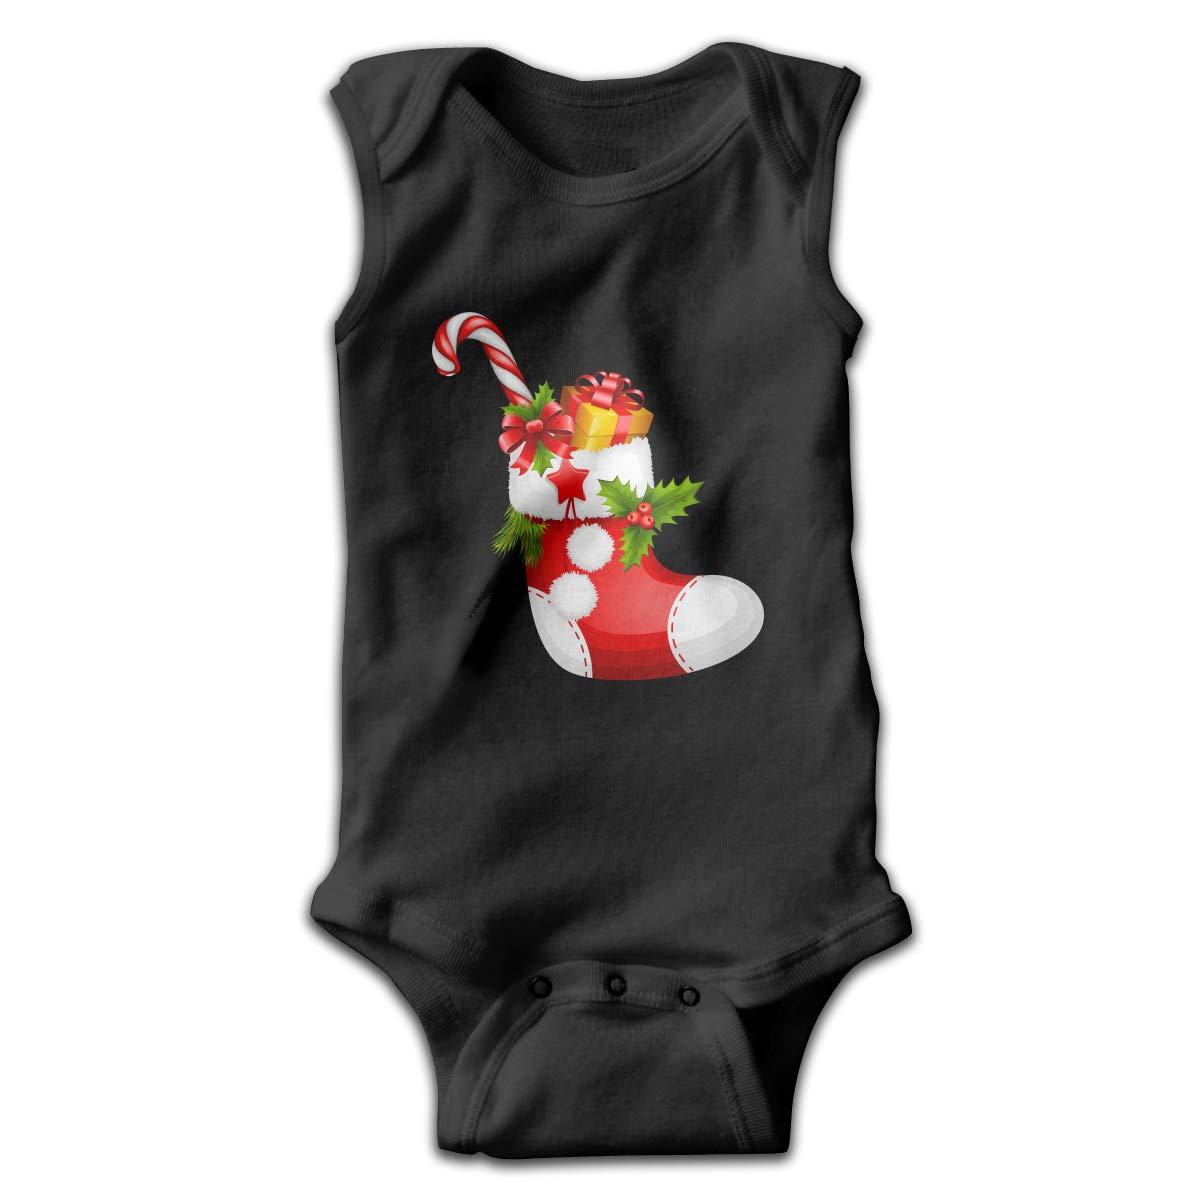 Efbj Toddler Baby Boys Rompers Sleeveless Cotton Jumpsuit,Christmas Stocking with Candy Bodysuit Autumn Pajamas